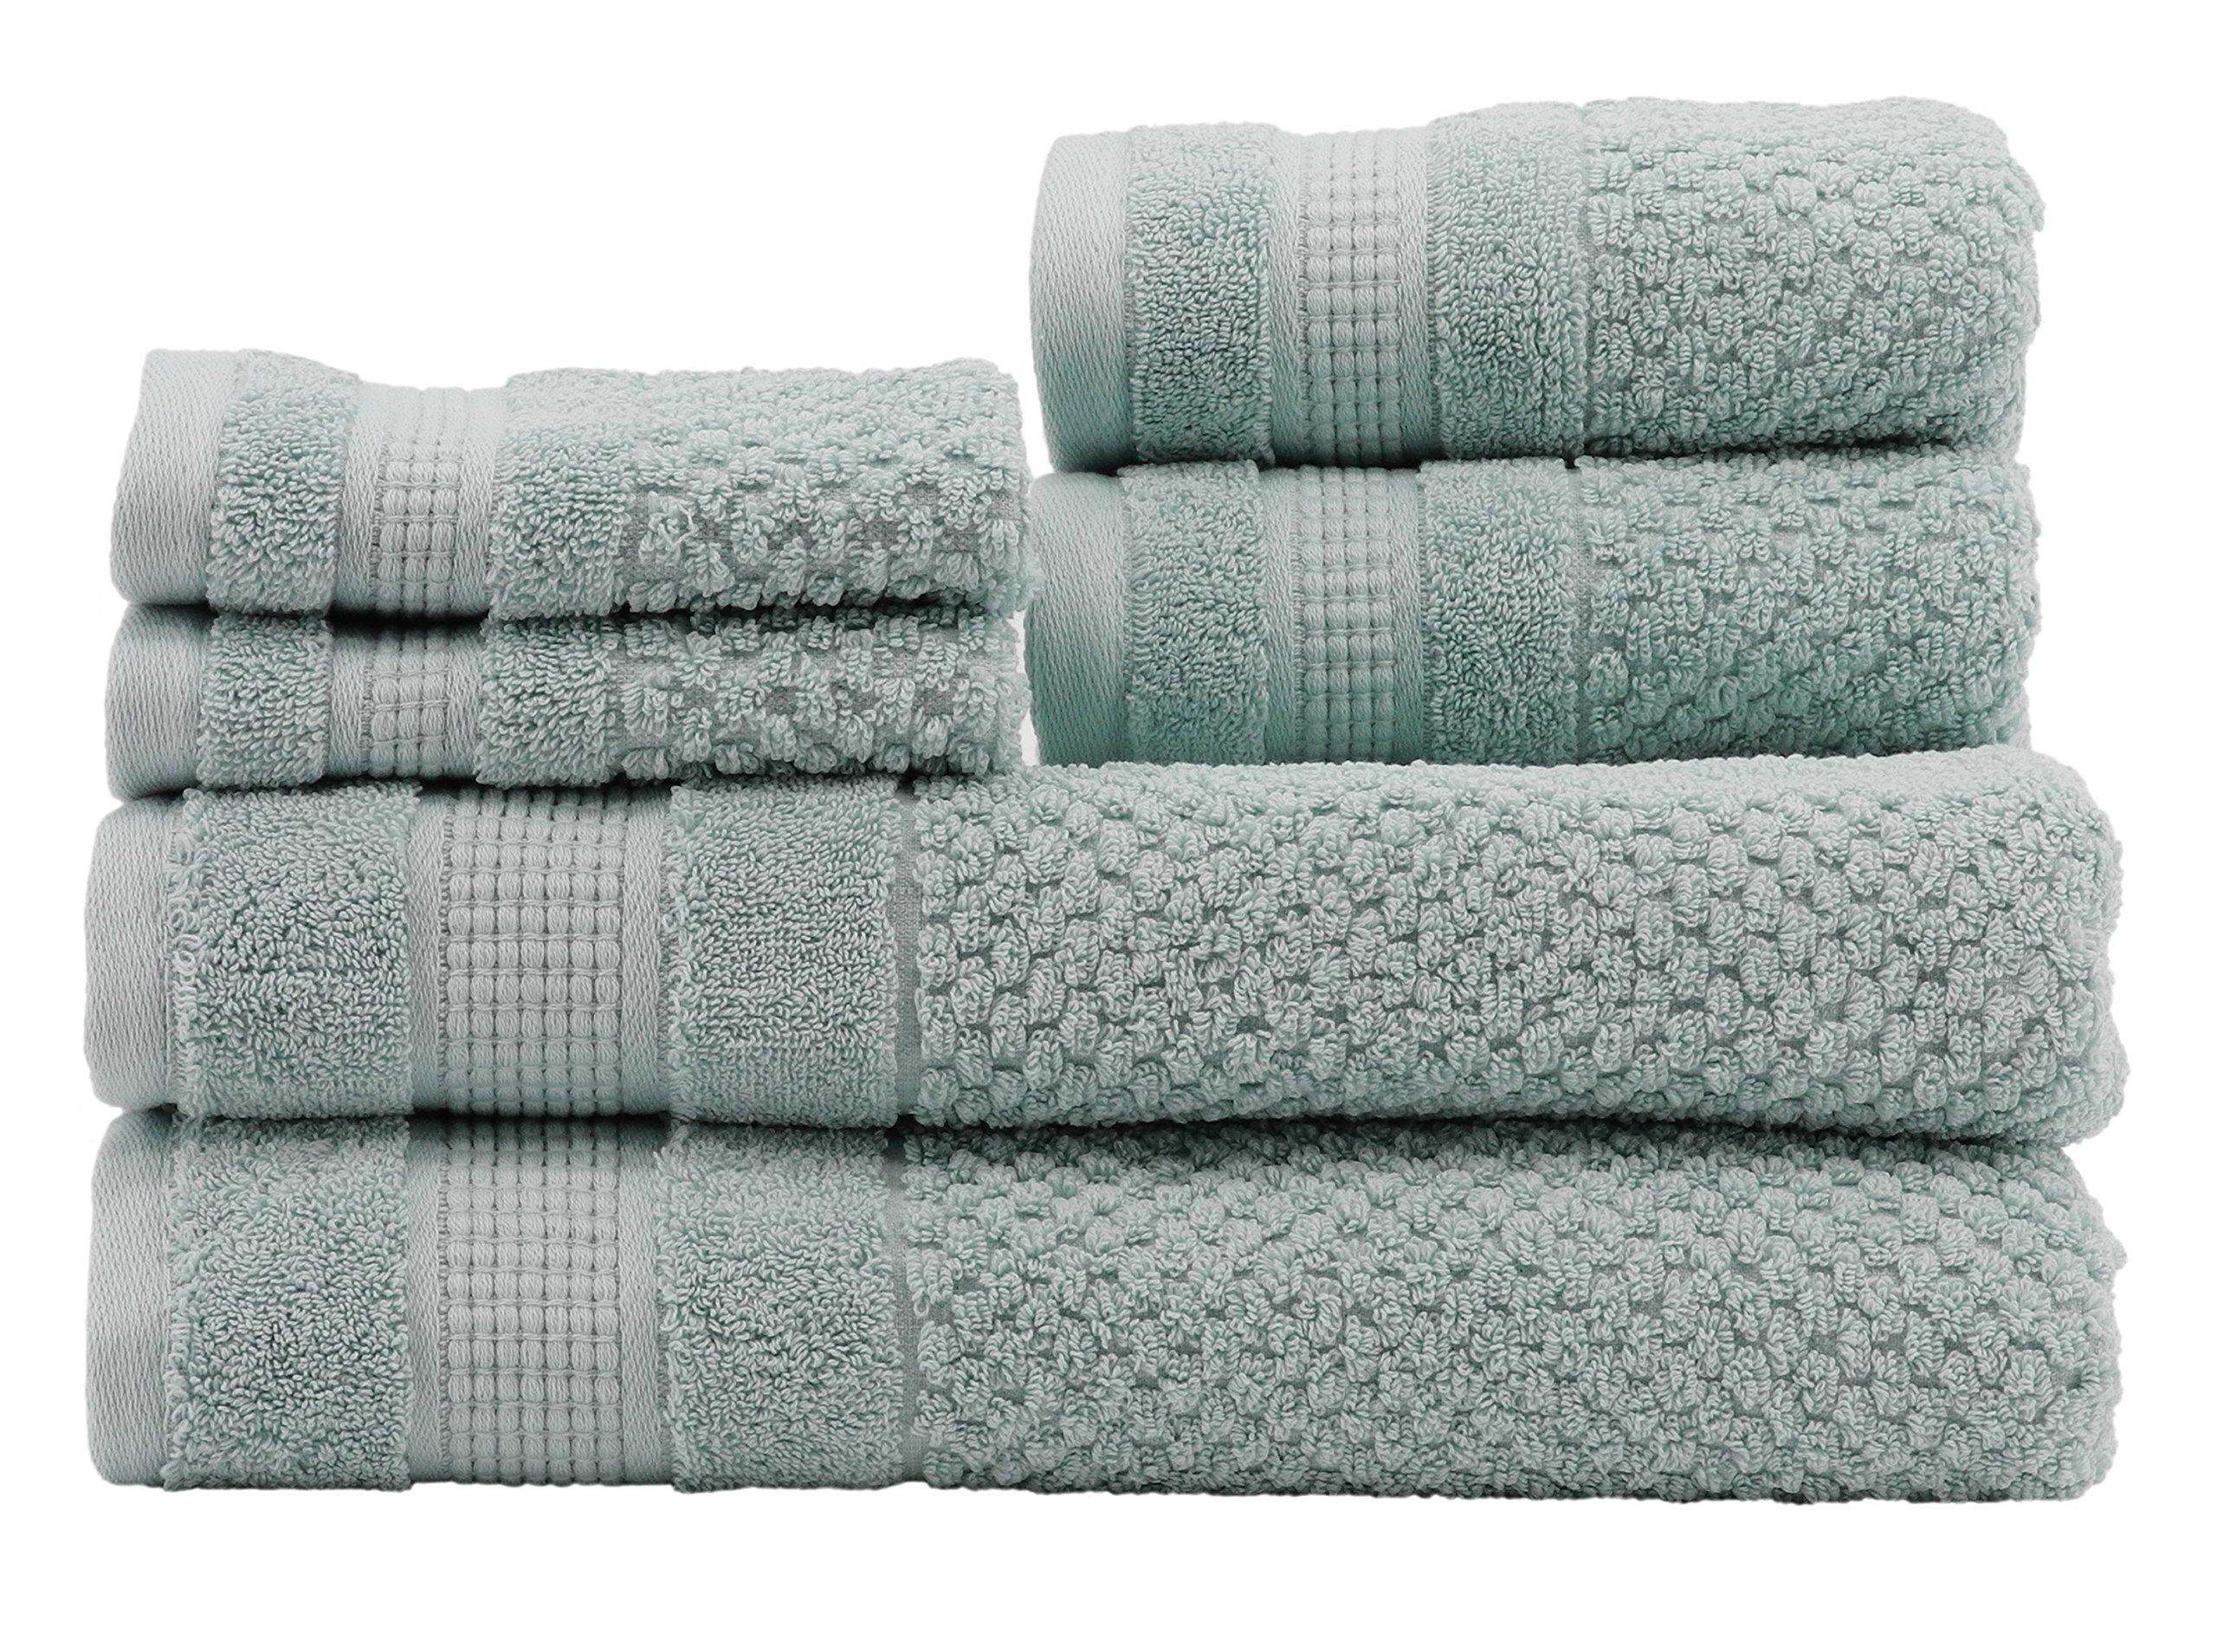 Caro Home Pebble 6 Piece Bath Towel Set, Large, Eggshell